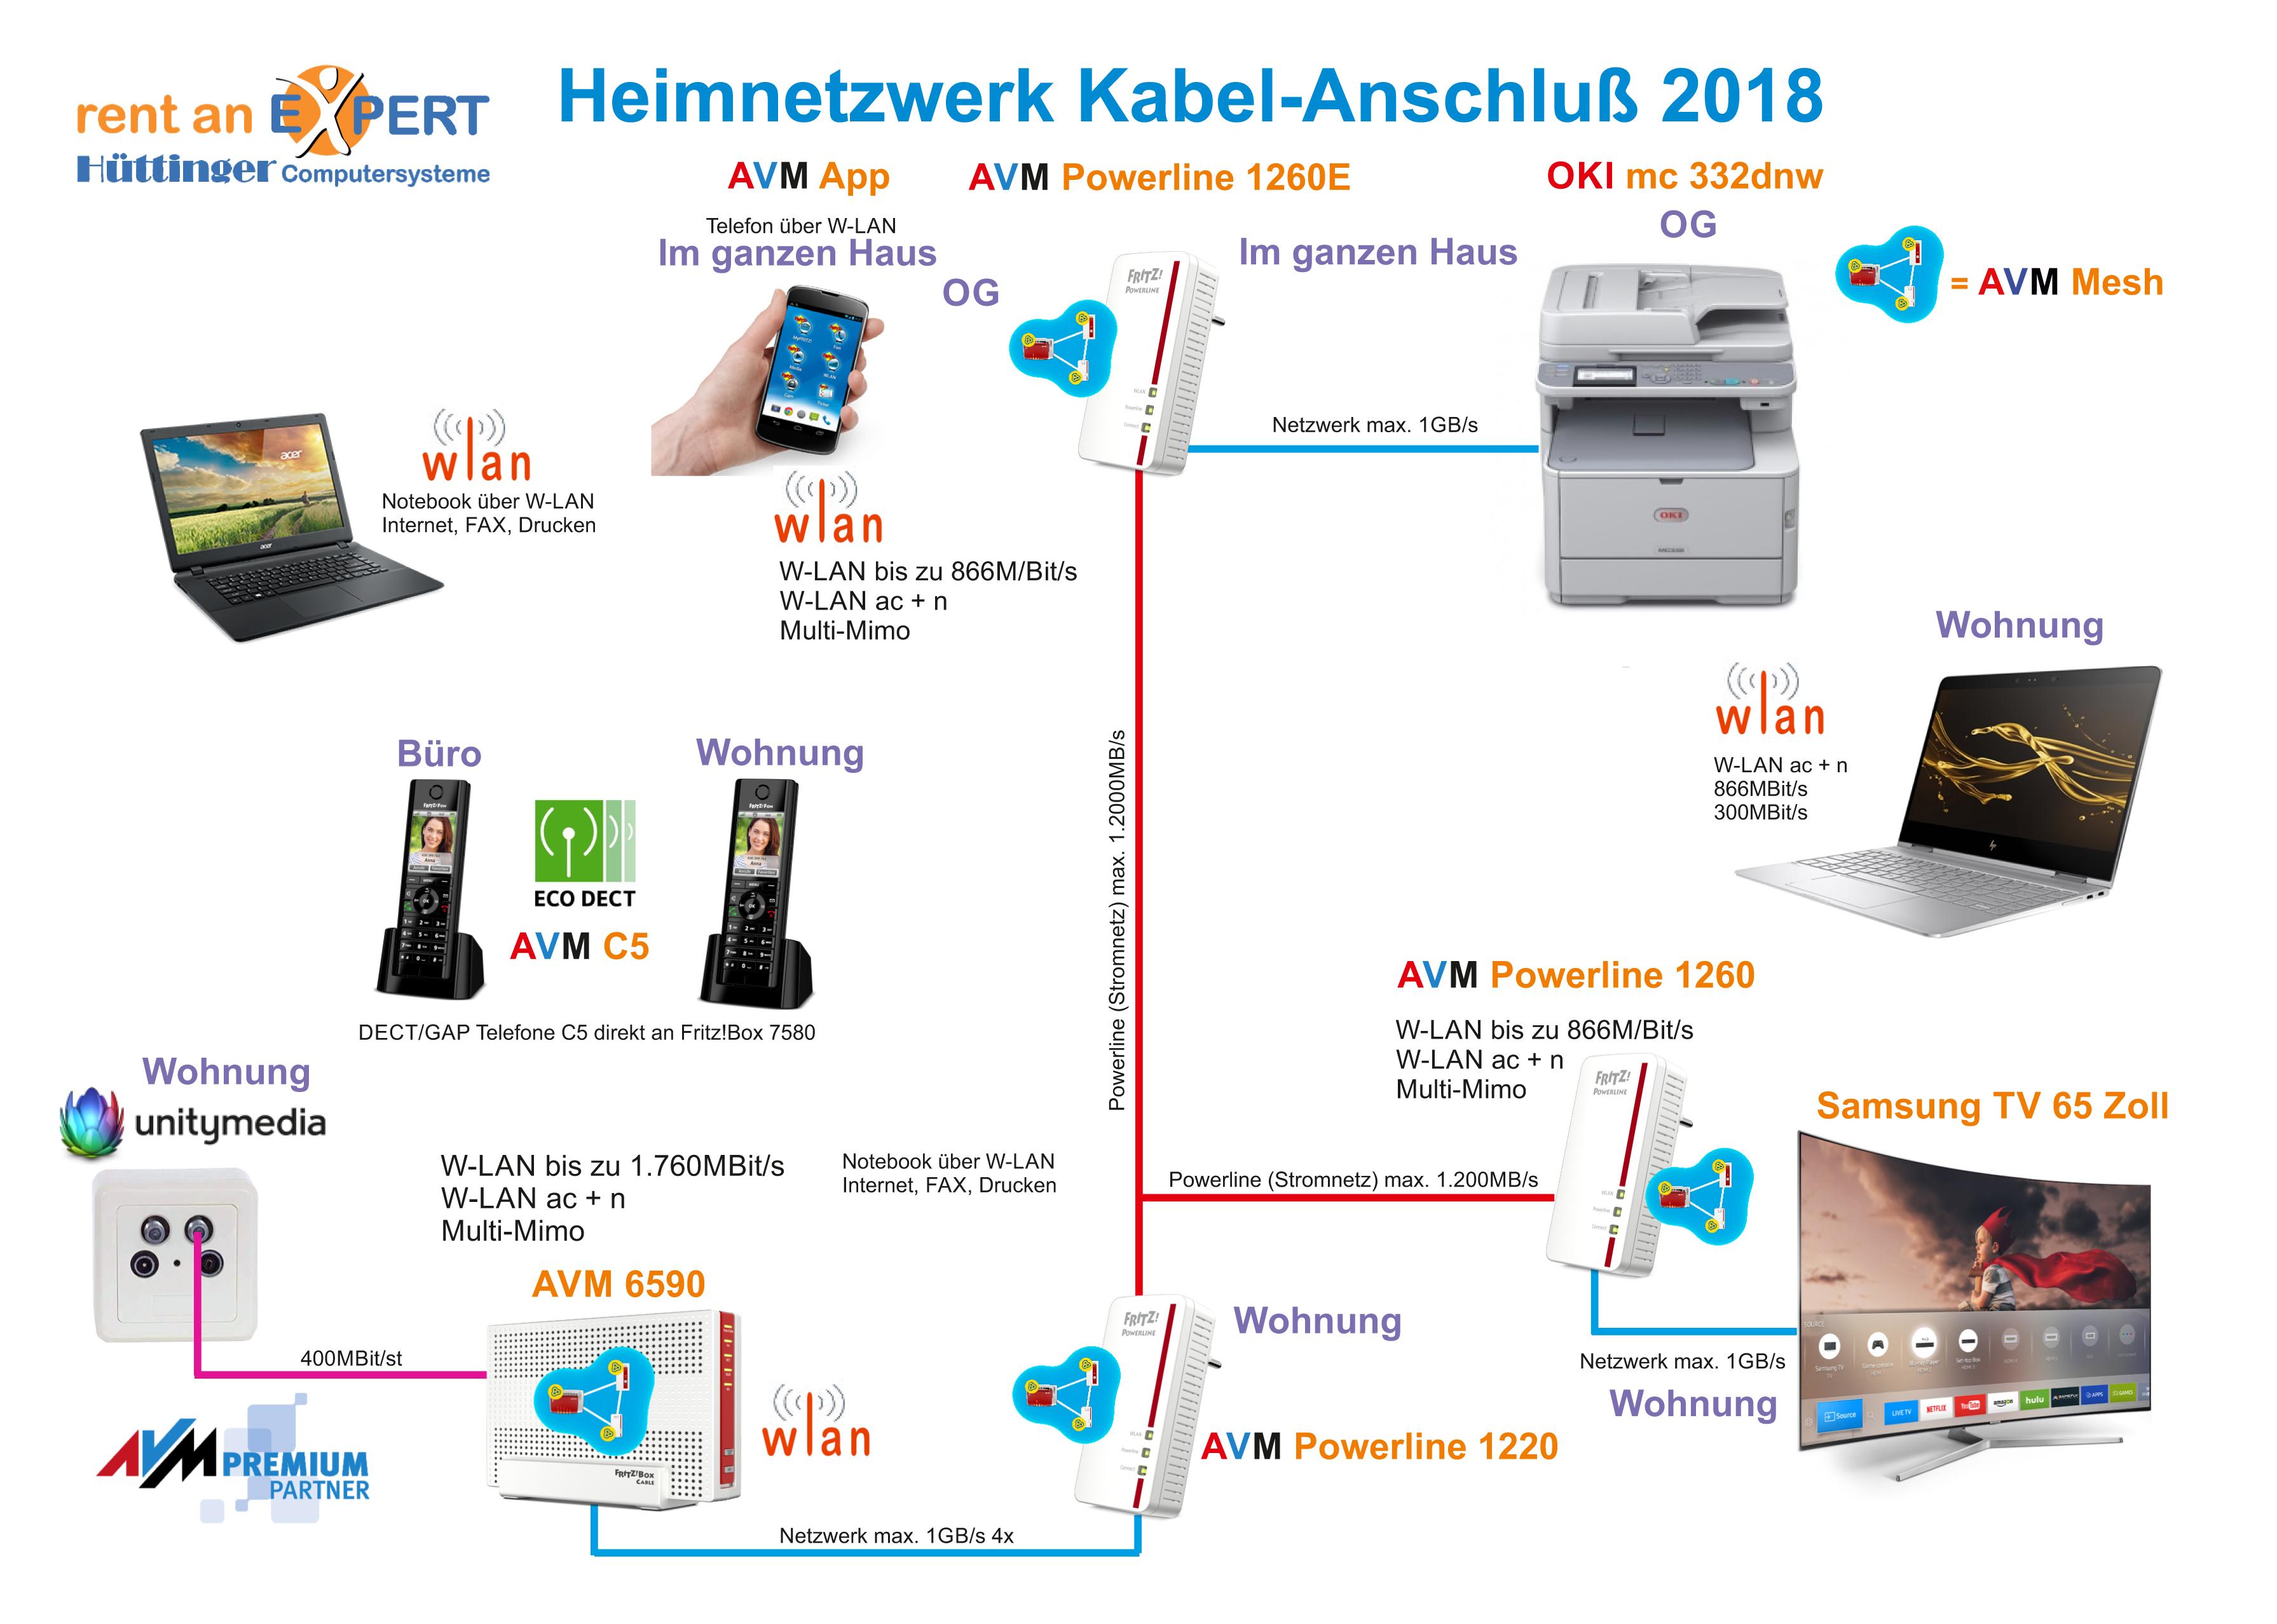 Kabel - Anschluß Unitymedia 2018.cdr